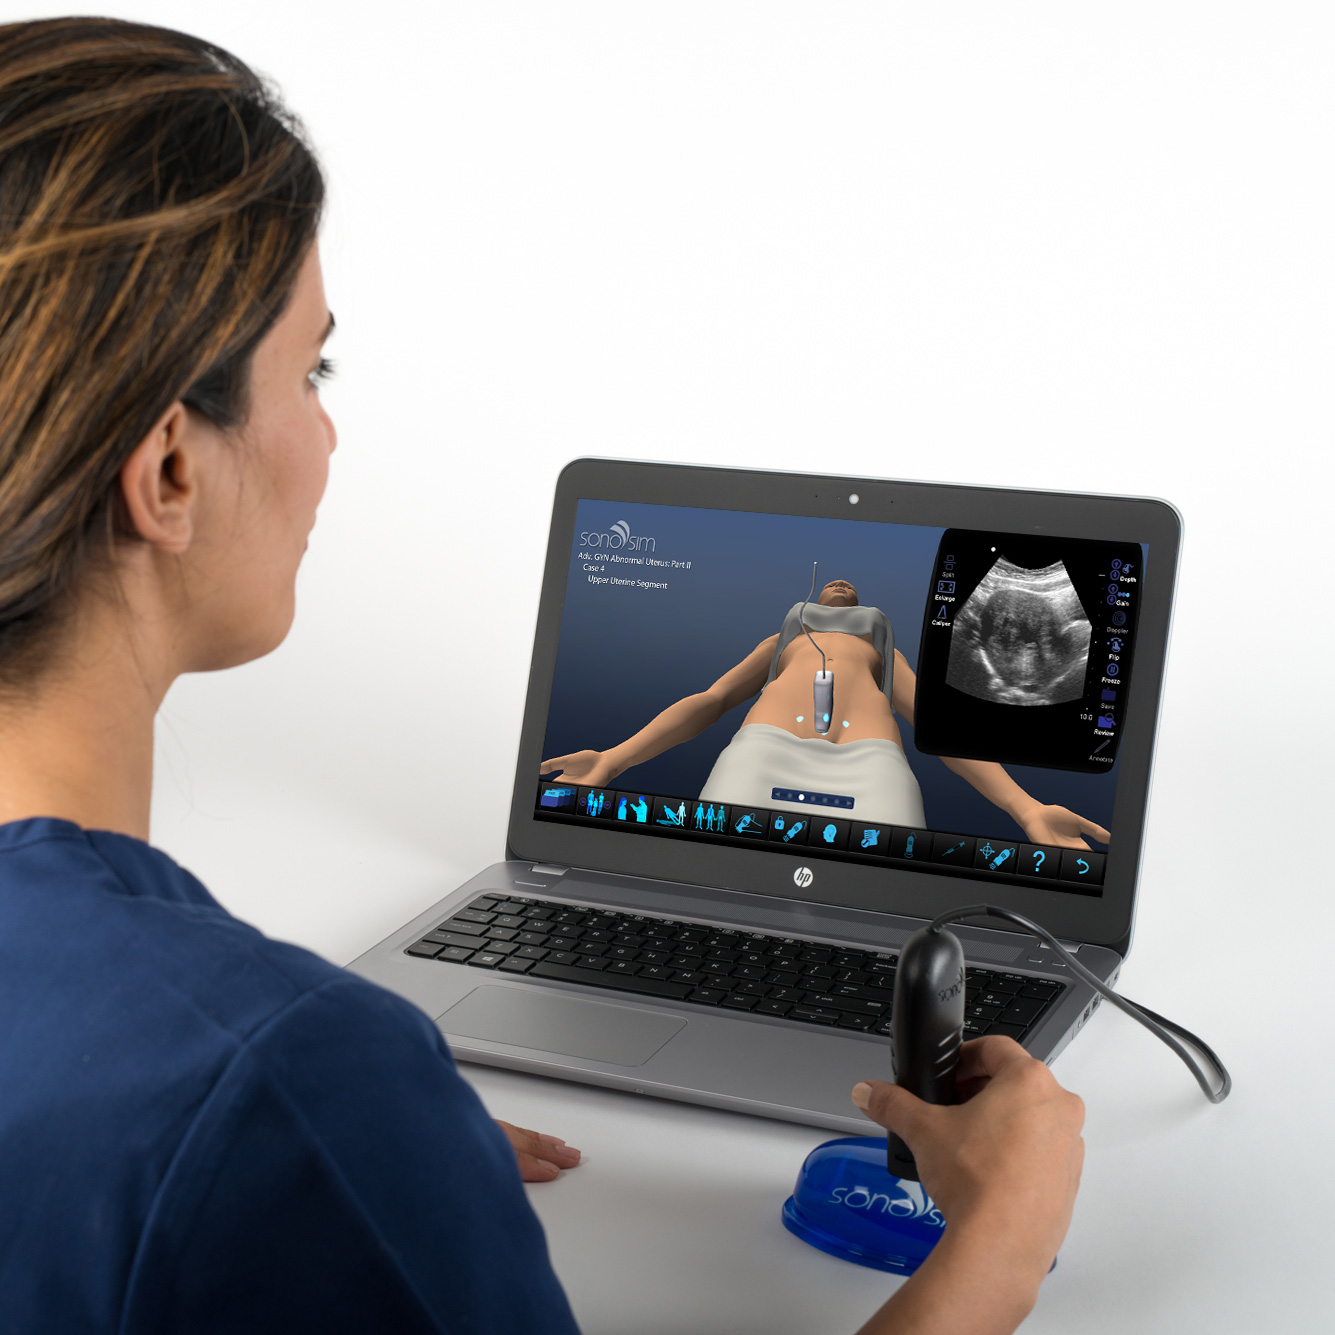 Ultraschallsimulator für GYN-Ultraschall bei nicht-schwangeren abnormen Gebärmutter - Teil II: Fortgeschrittenes klinisches Modul